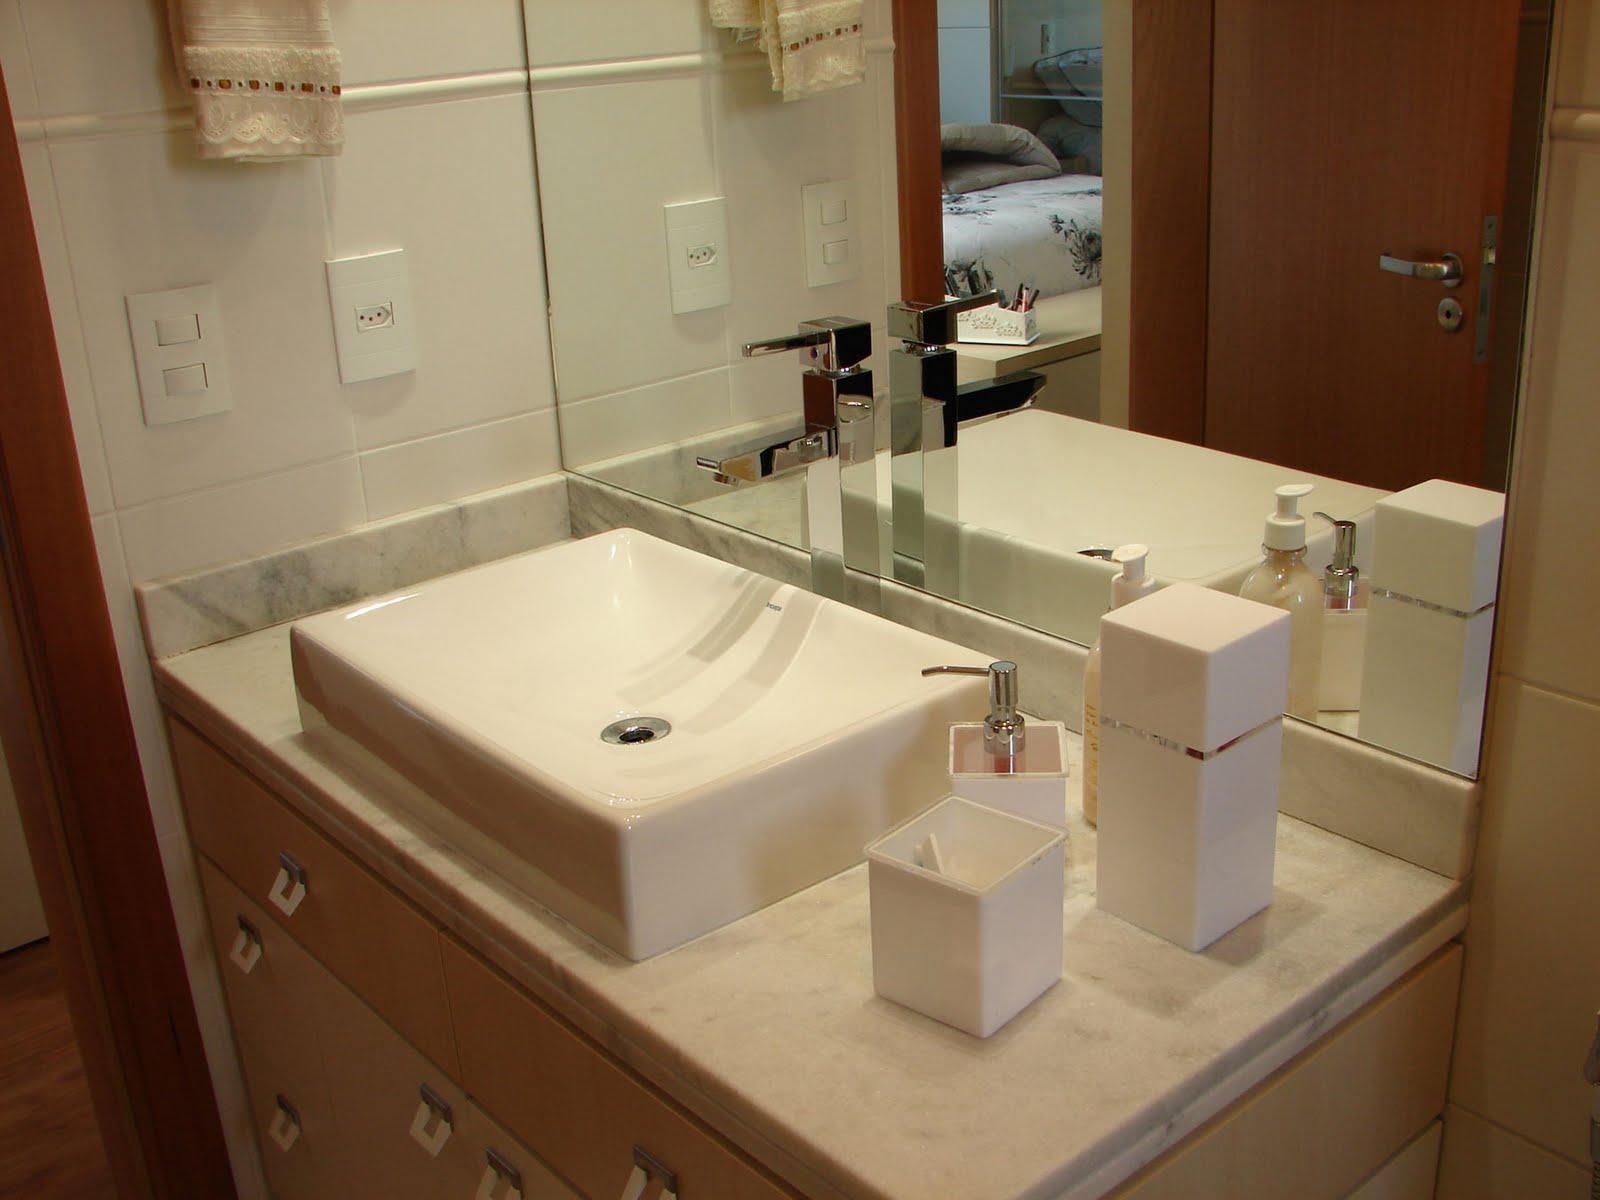 Cubbos Consultoria Arquitetura de Interiores Banheiros Reciclando ambientes -> Cuba Para Pia De Banheiro De Apoio